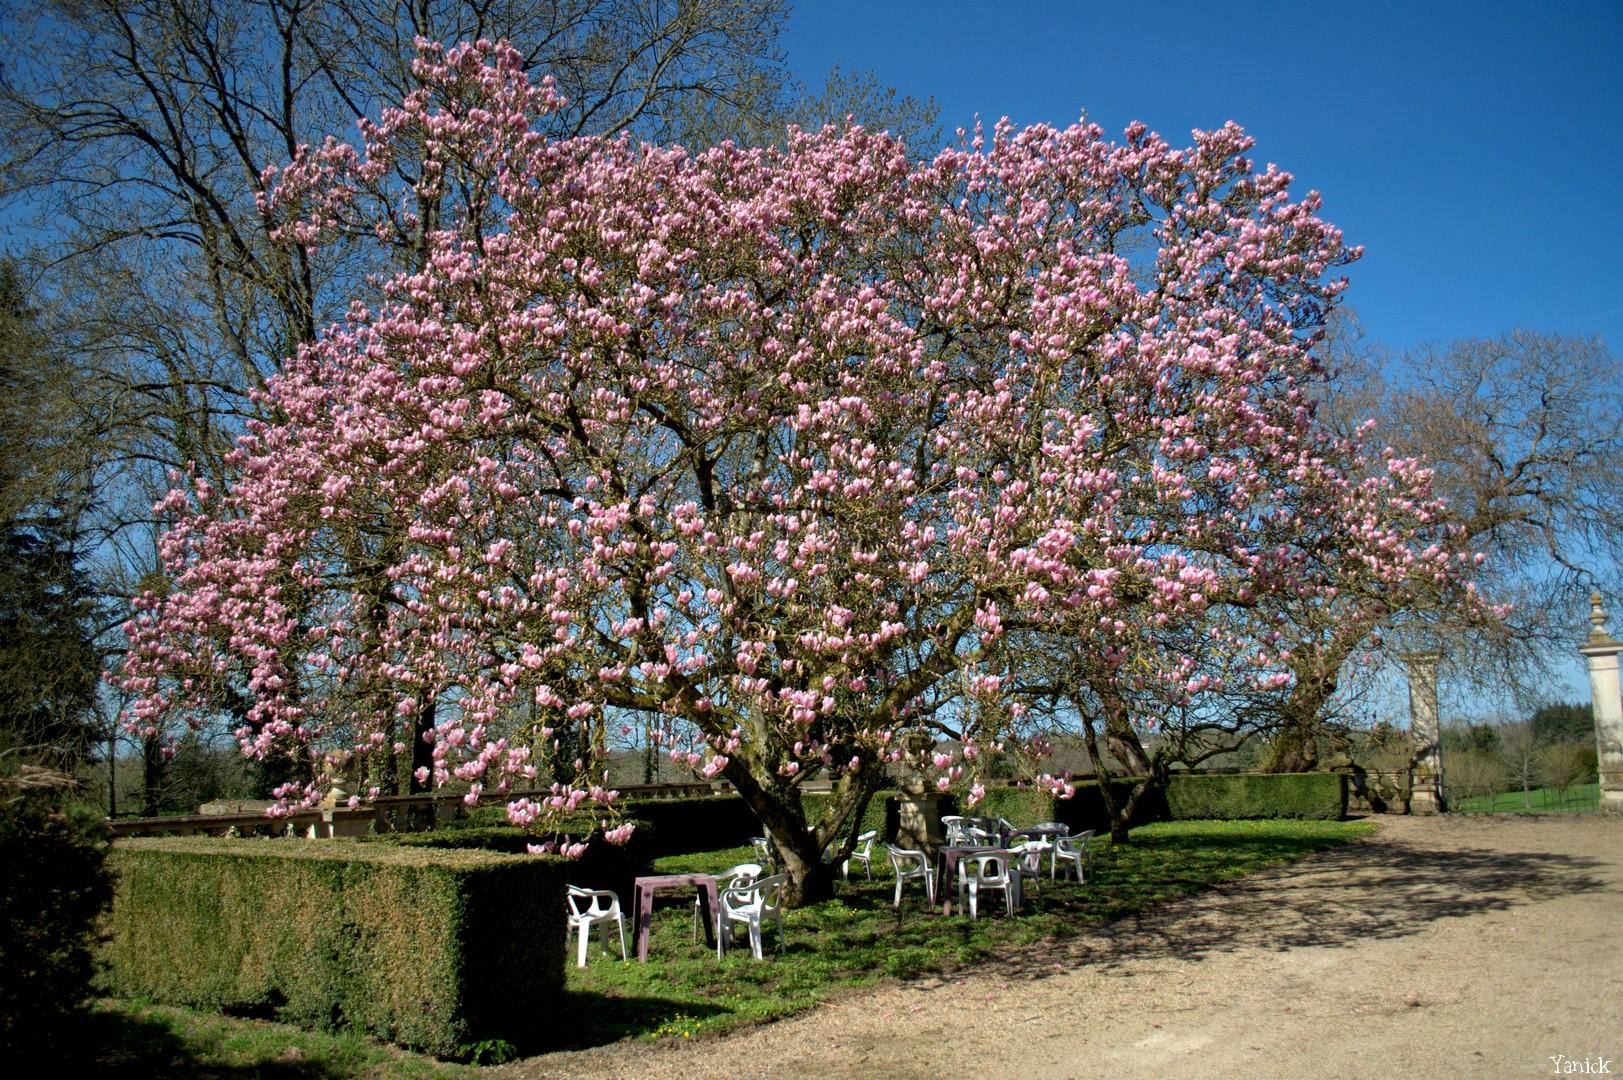 Magnolia - Petit chêne 03 ©Yanick